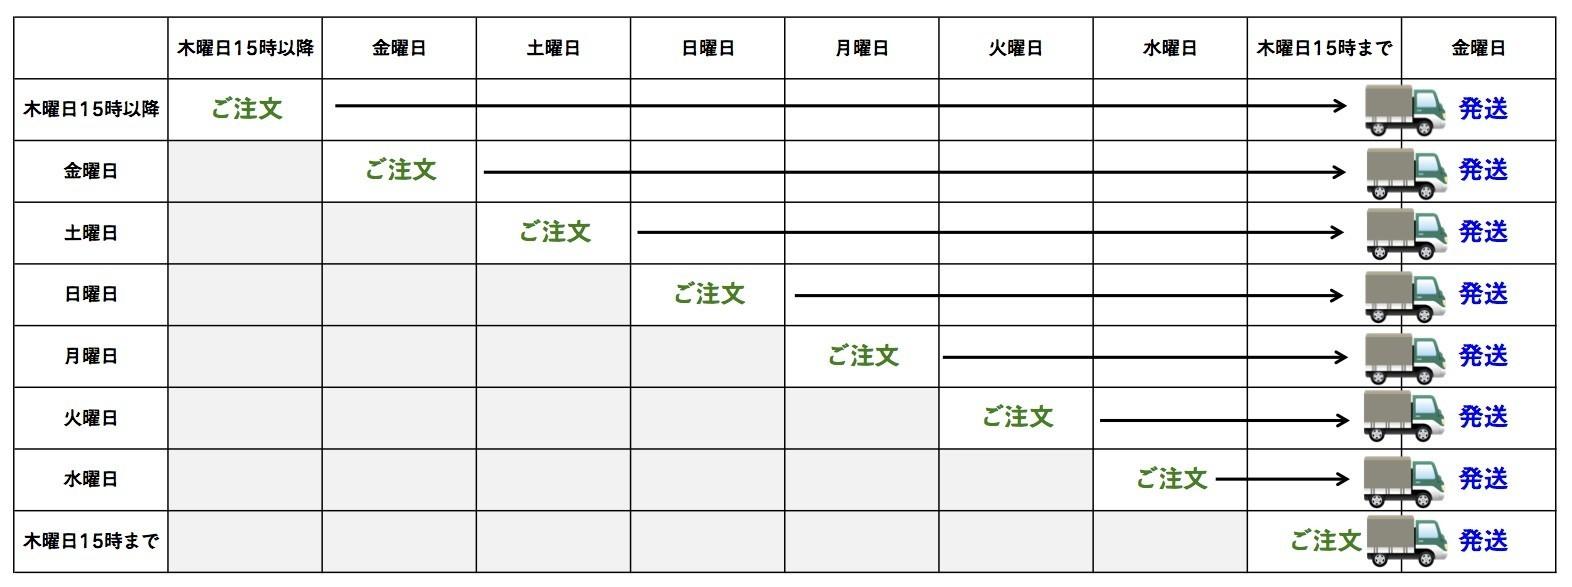 "【Rez Infinite】レコード・セット(2LP+7""+BOOK / 日本限定特典付き) - 画像5"